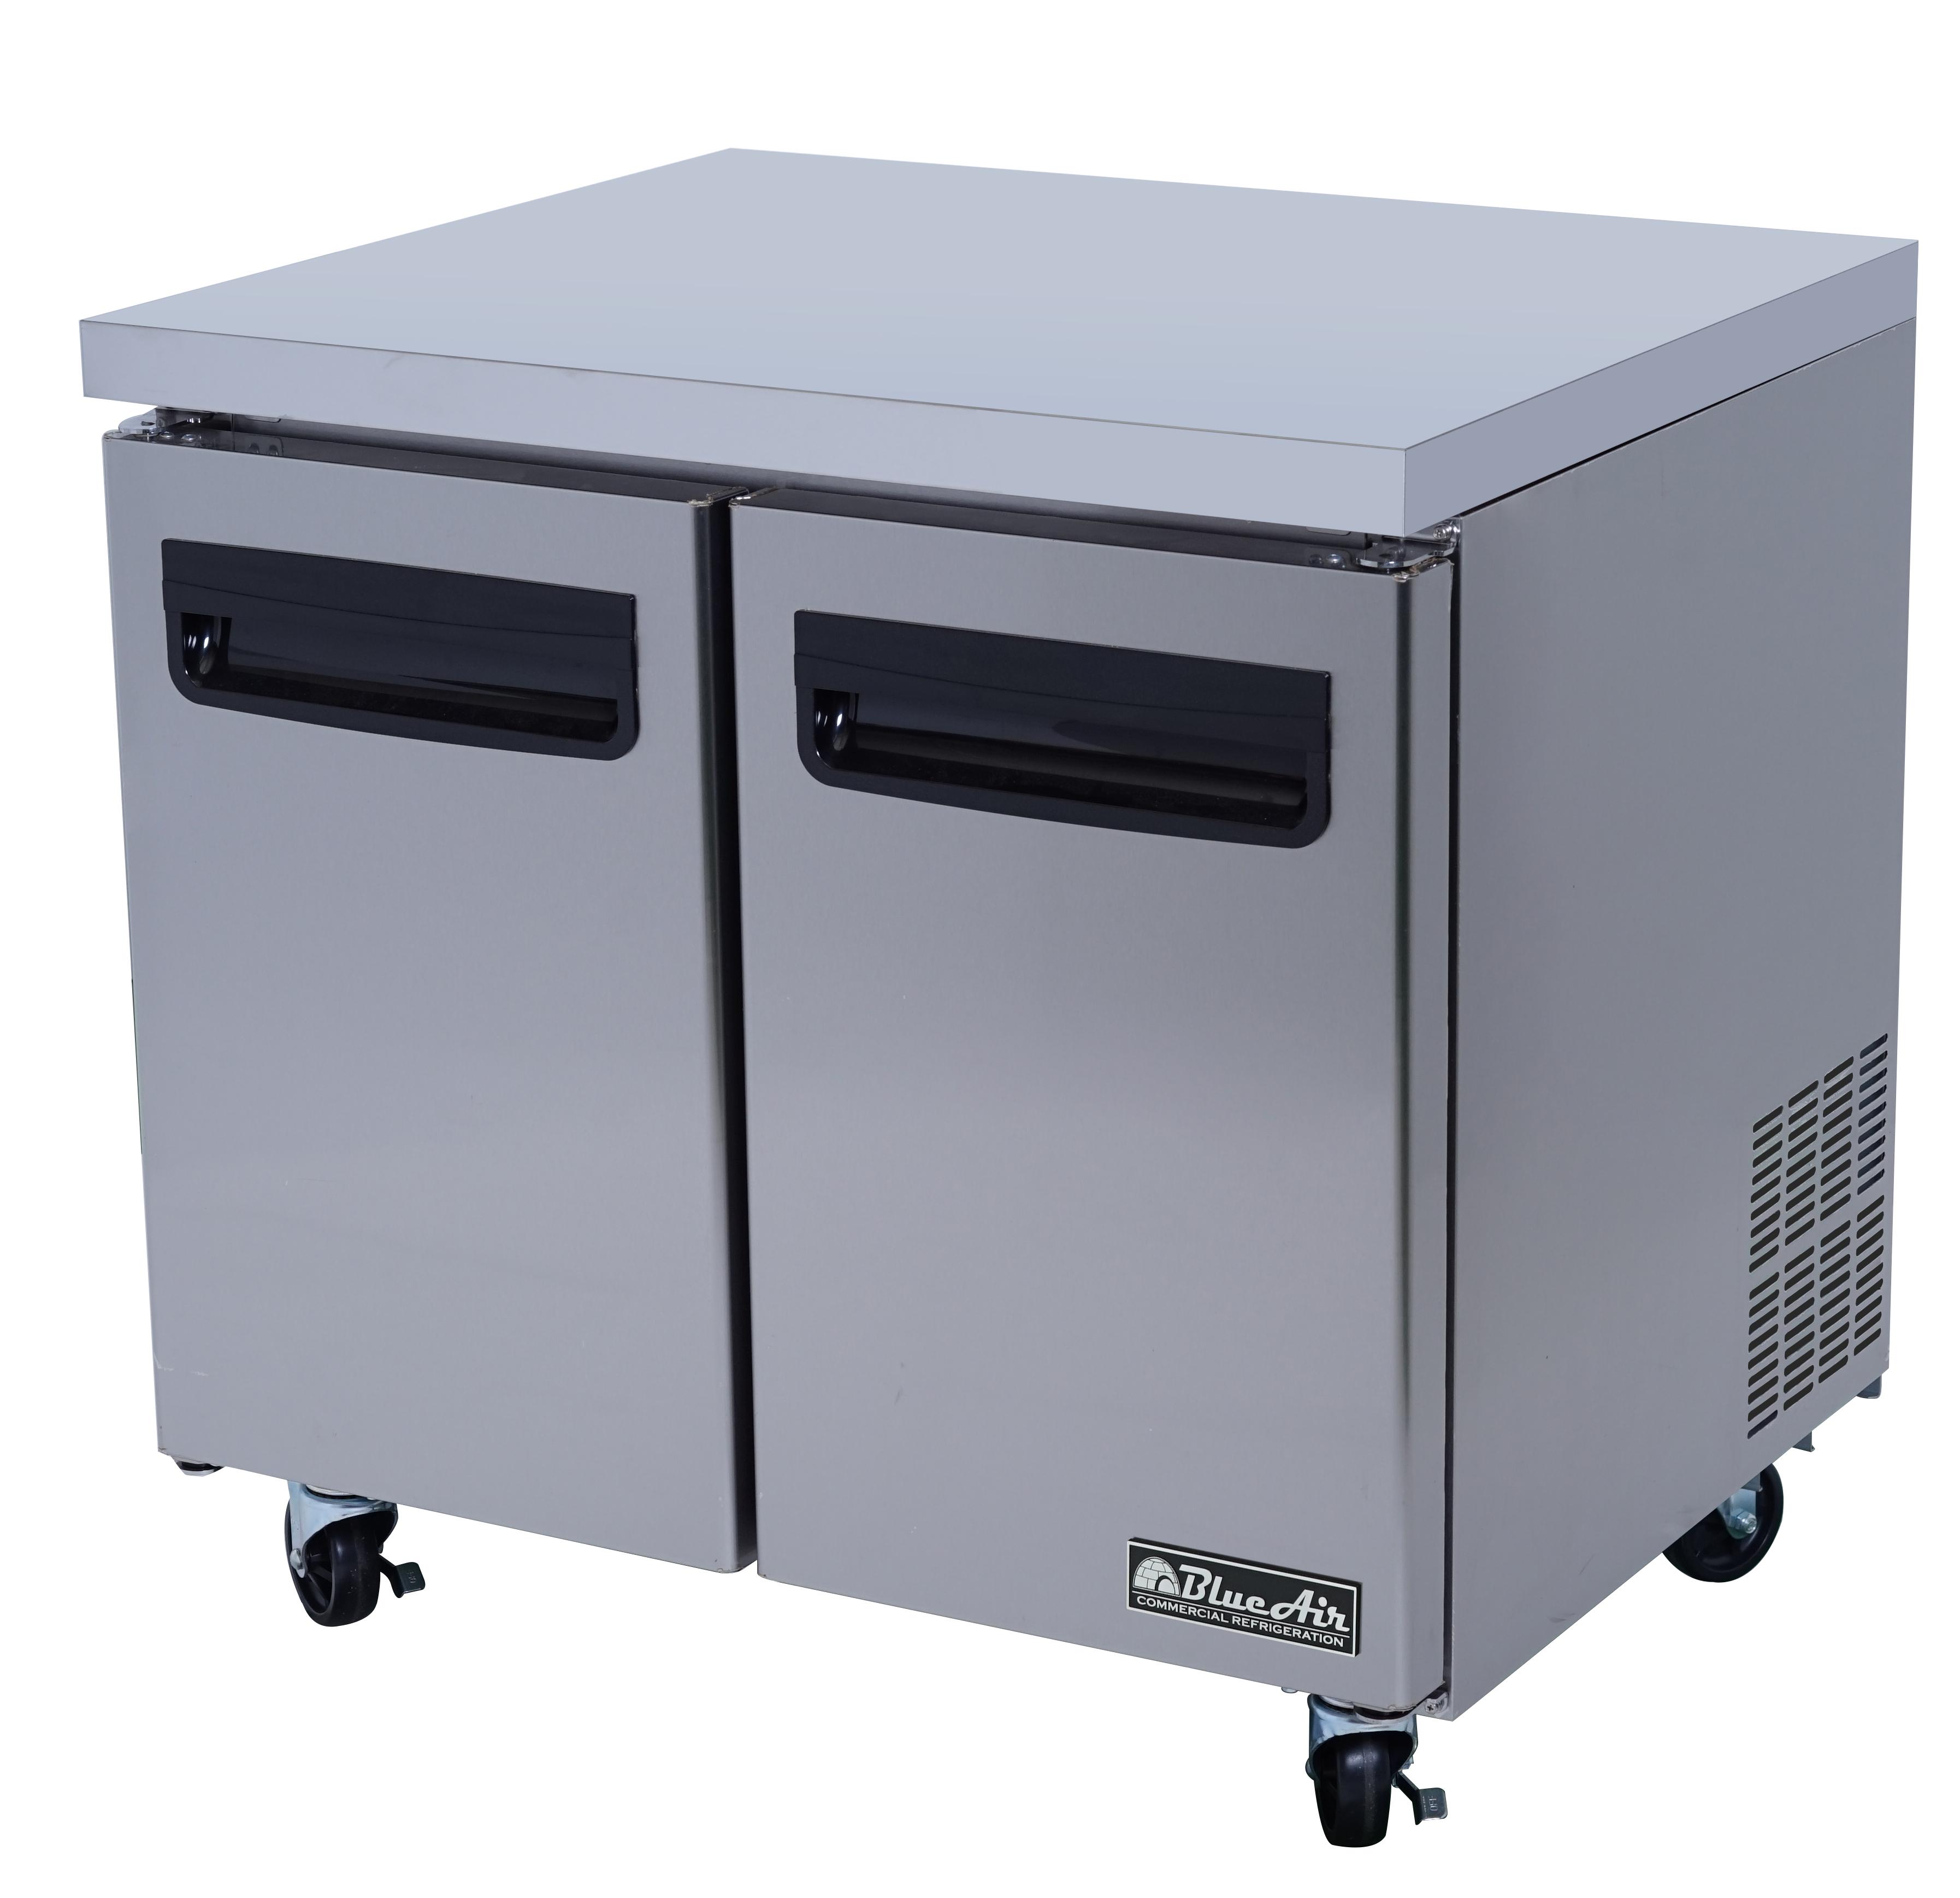 BLUR36 Blue Air Commercial Refrigeration refrigerator, undercounter, reach-in